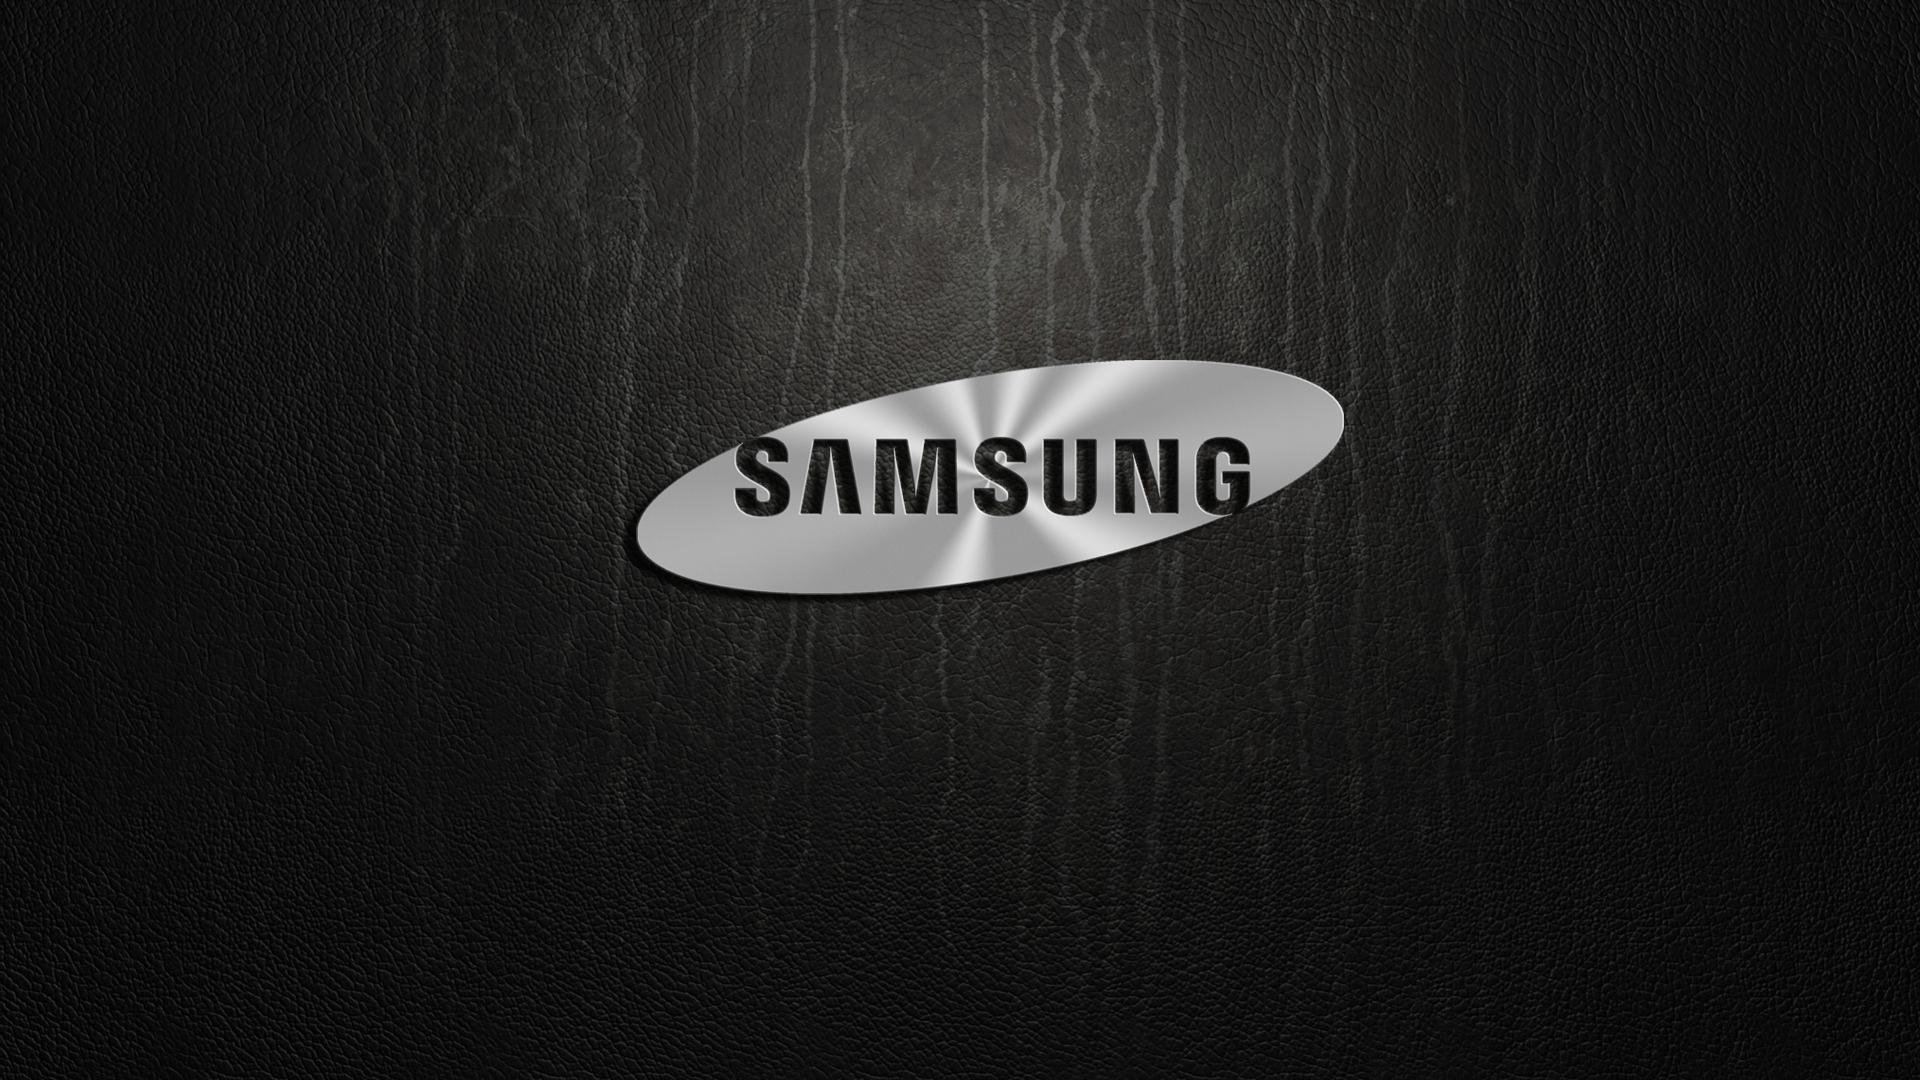 72 Samsung Wallpaper Gallery On Wallpapersafari